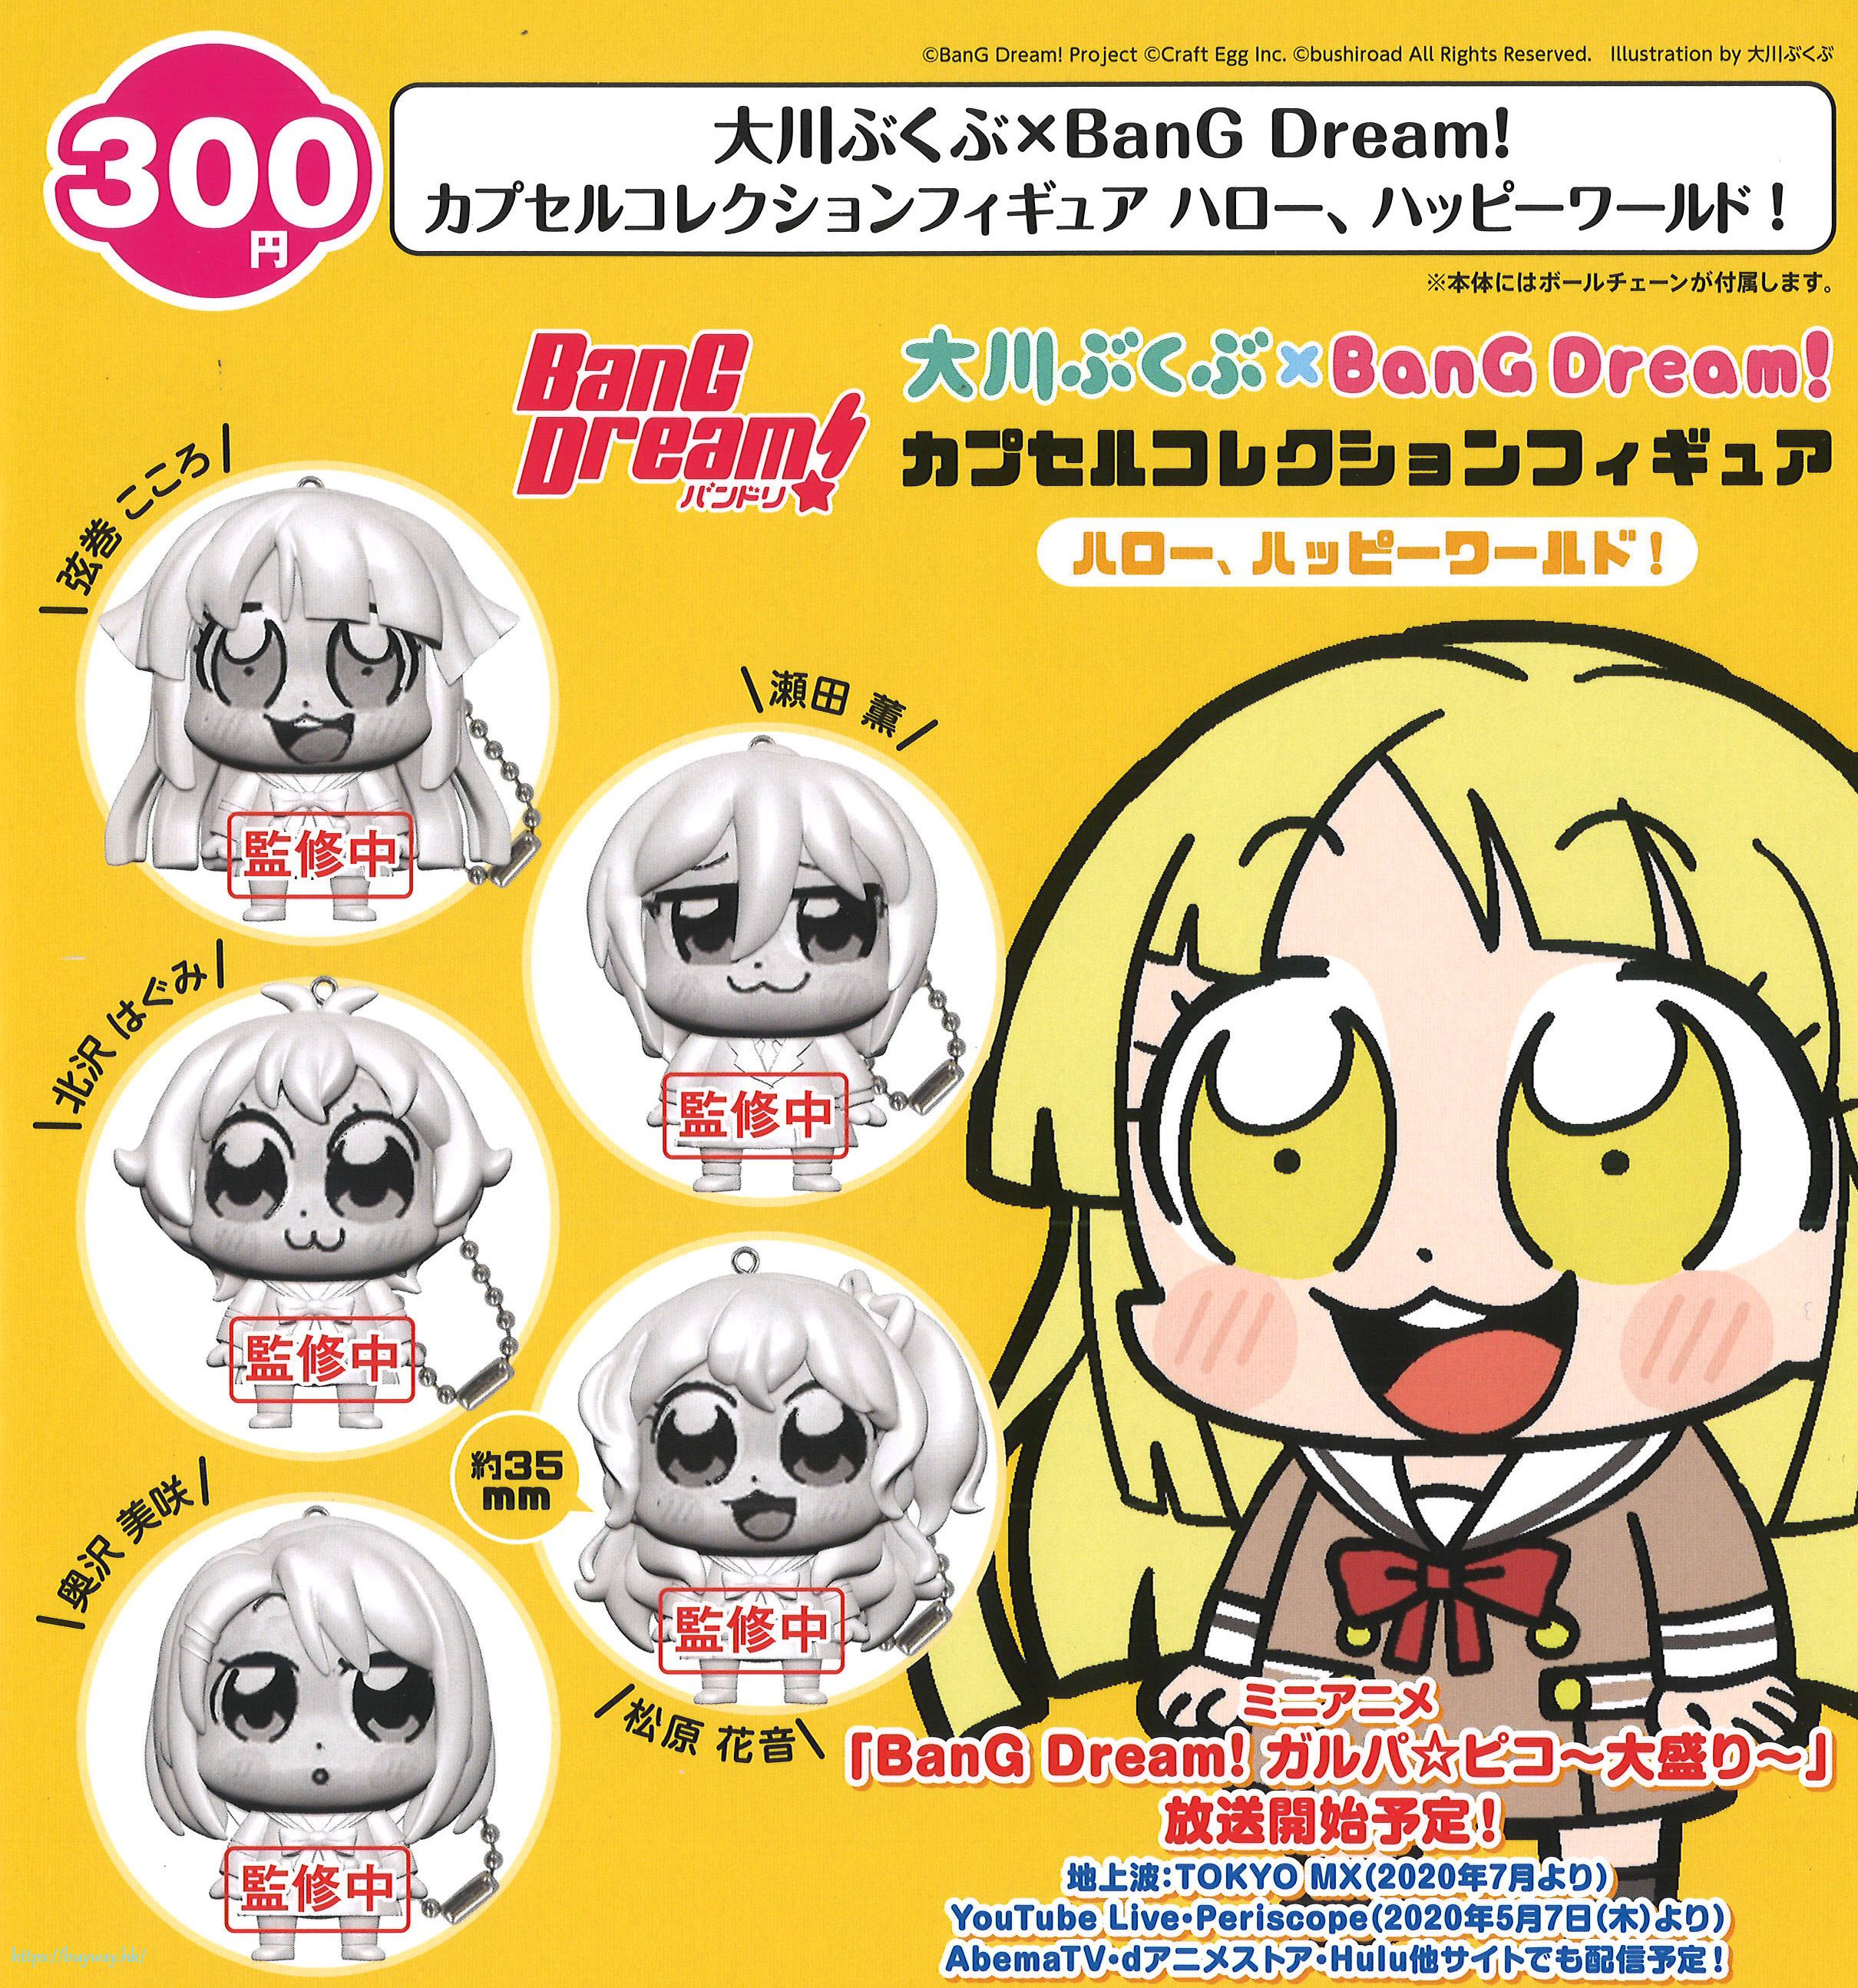 BanG Dream! 「Hello, Happy World!」× 大川ぶくぶ 角色扭蛋 (40 個入) Bkub Okawa x Capsule Collection Figure Hello, Happy World! (40 Pieces)【BanG Dream!】